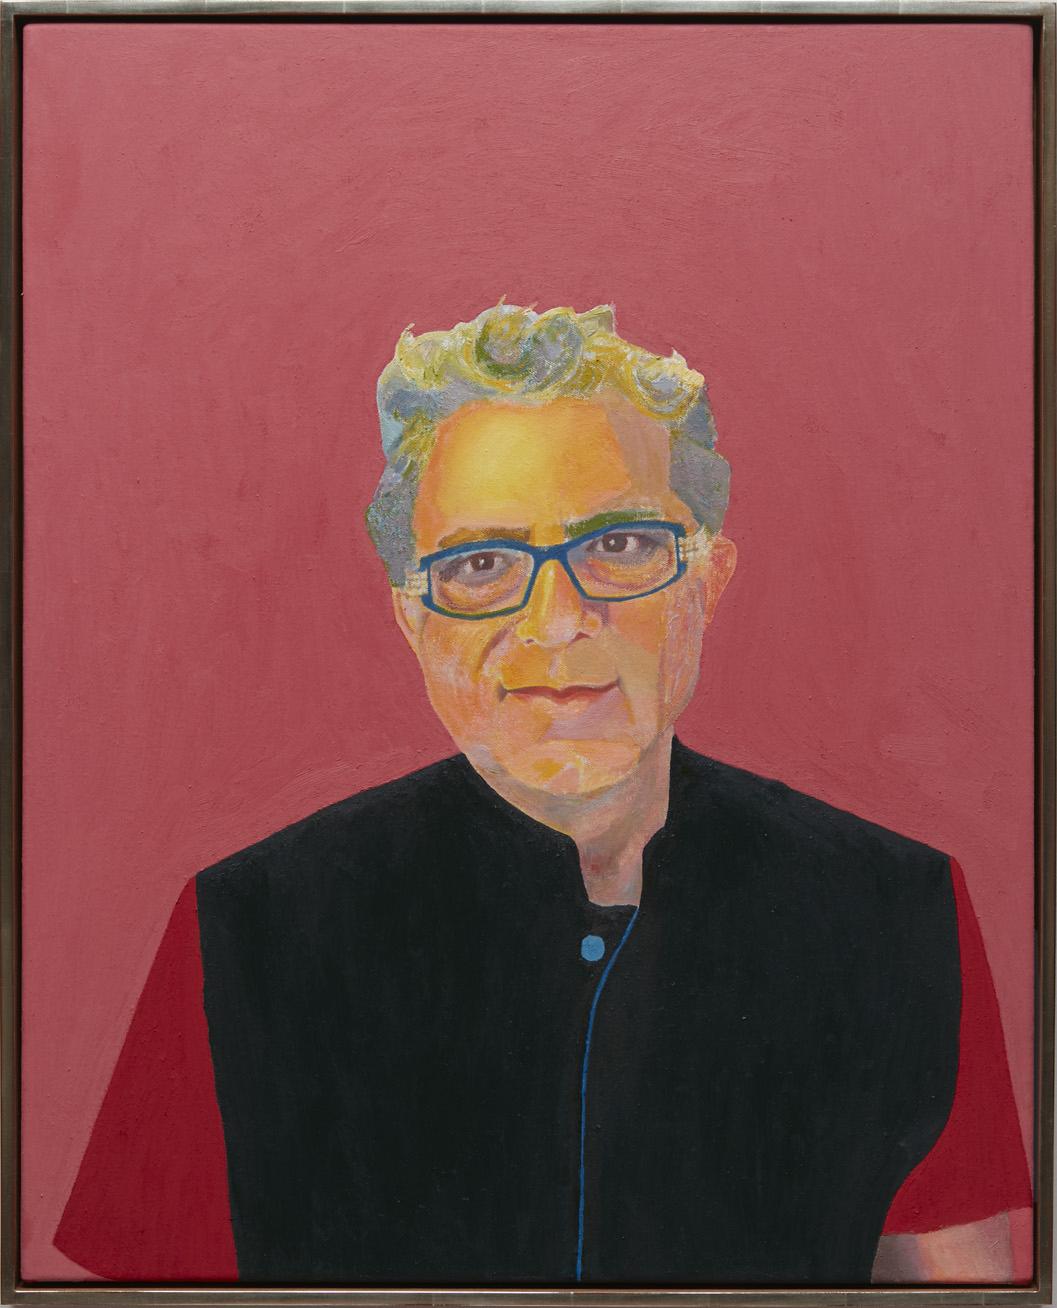 Deepak Chopra - oil on canvas, 30 x 24